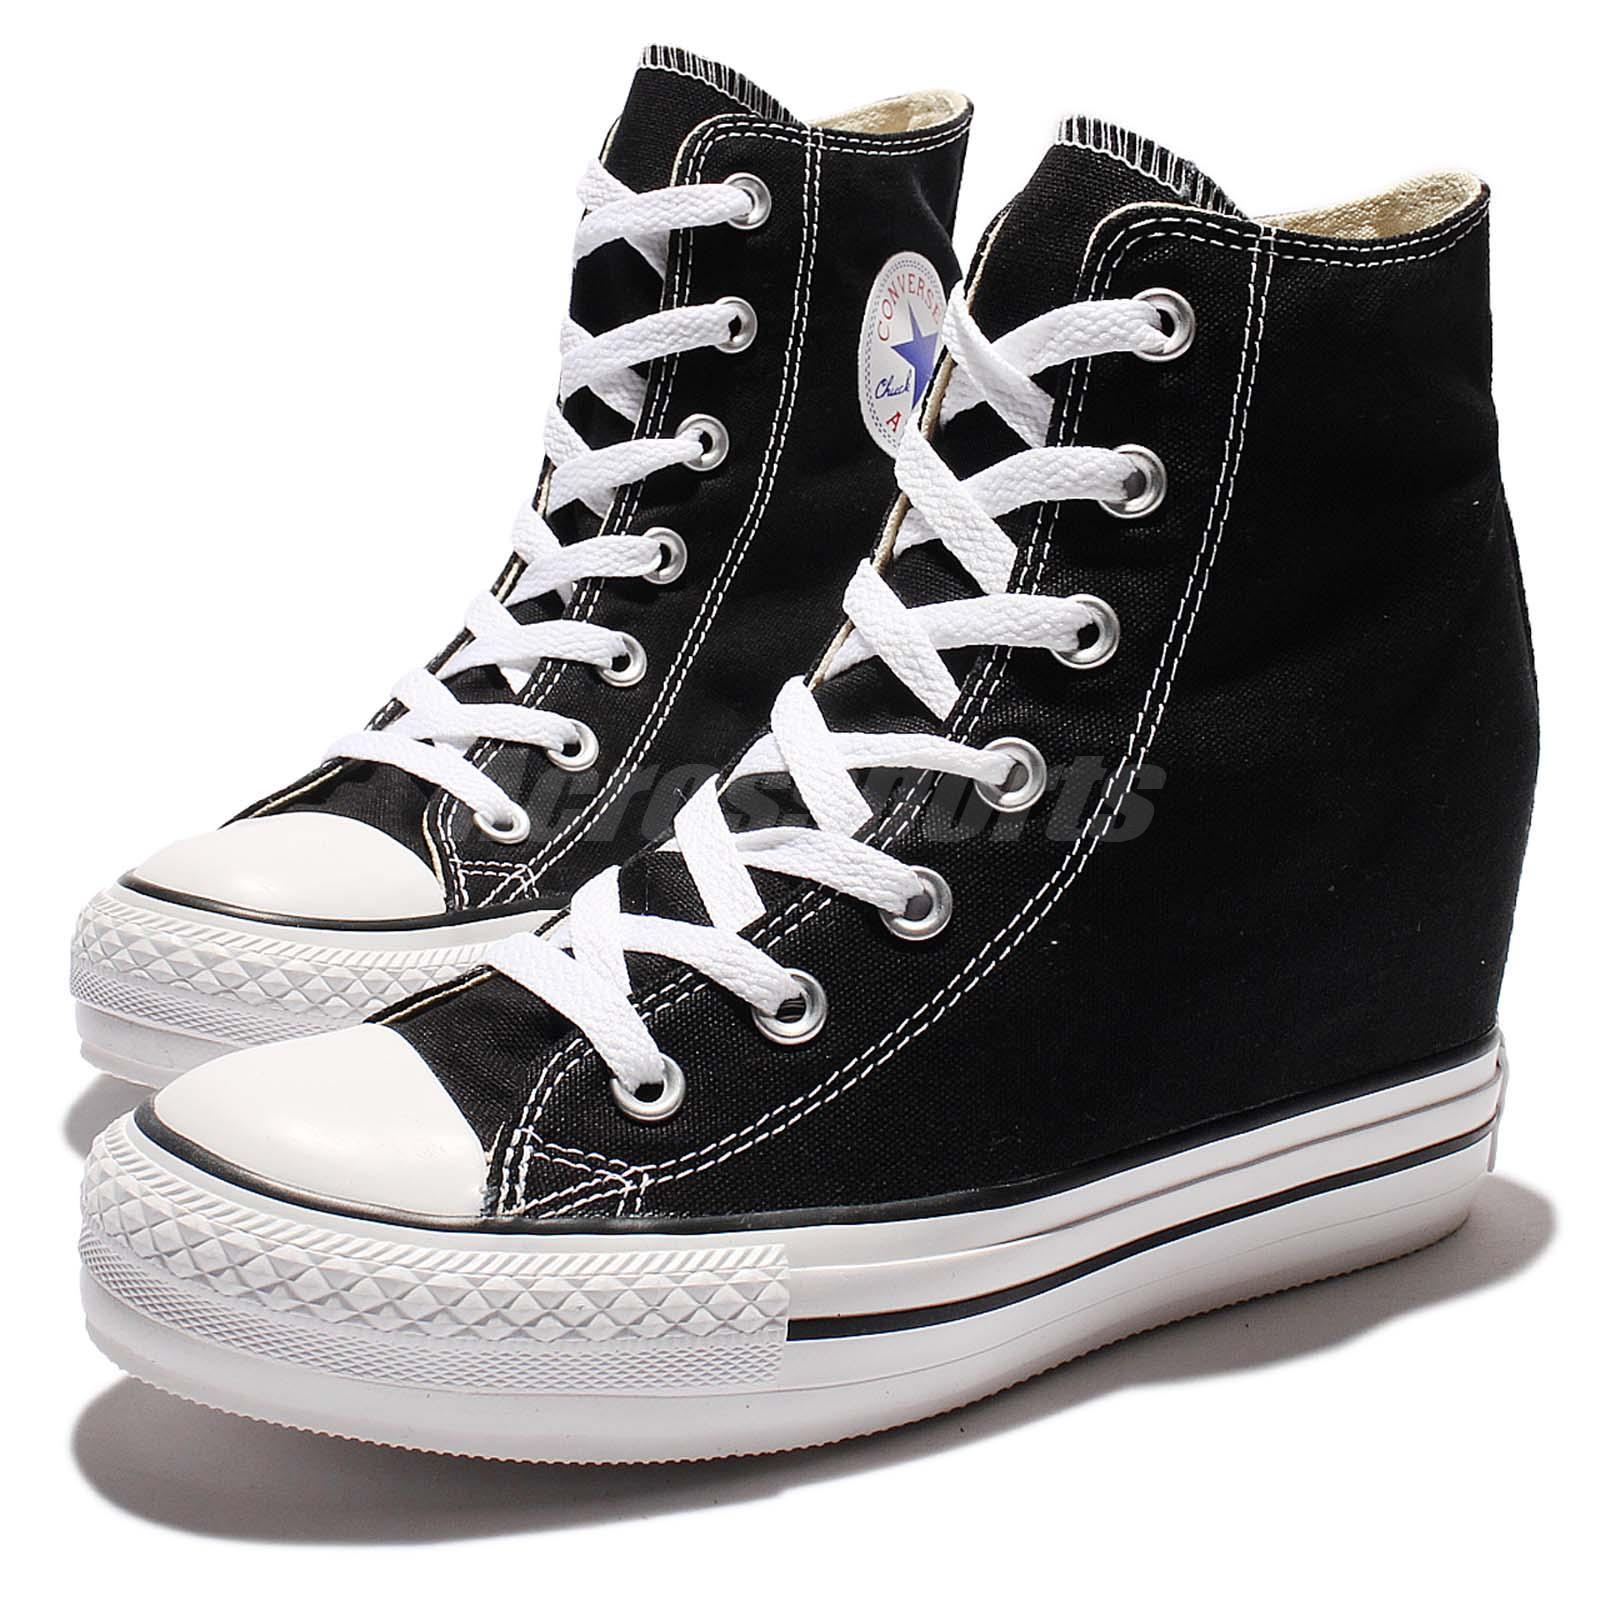 db84806eed53 converse wedge heel eBay - oukas.info